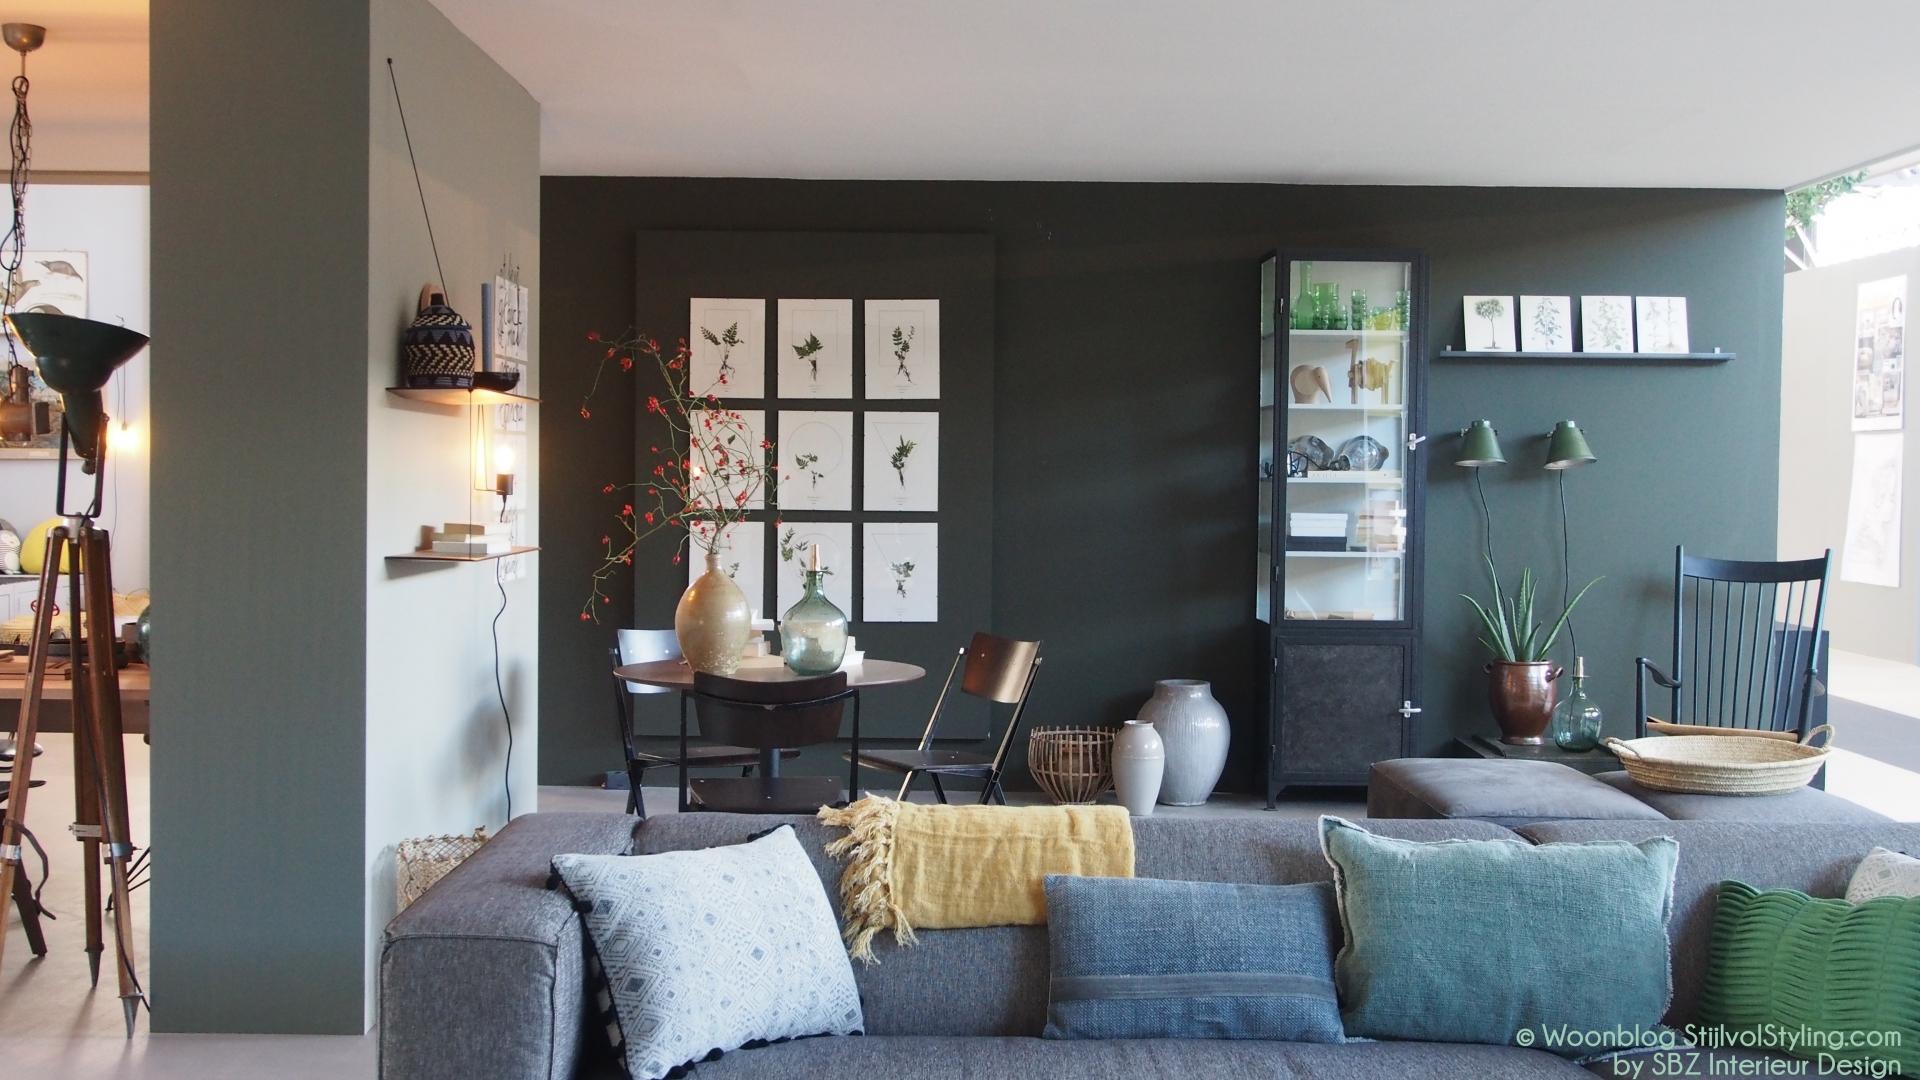 er op uit vtwonen design beurs woonfeest voor vele stijlvol styling lifestyle woonblog. Black Bedroom Furniture Sets. Home Design Ideas